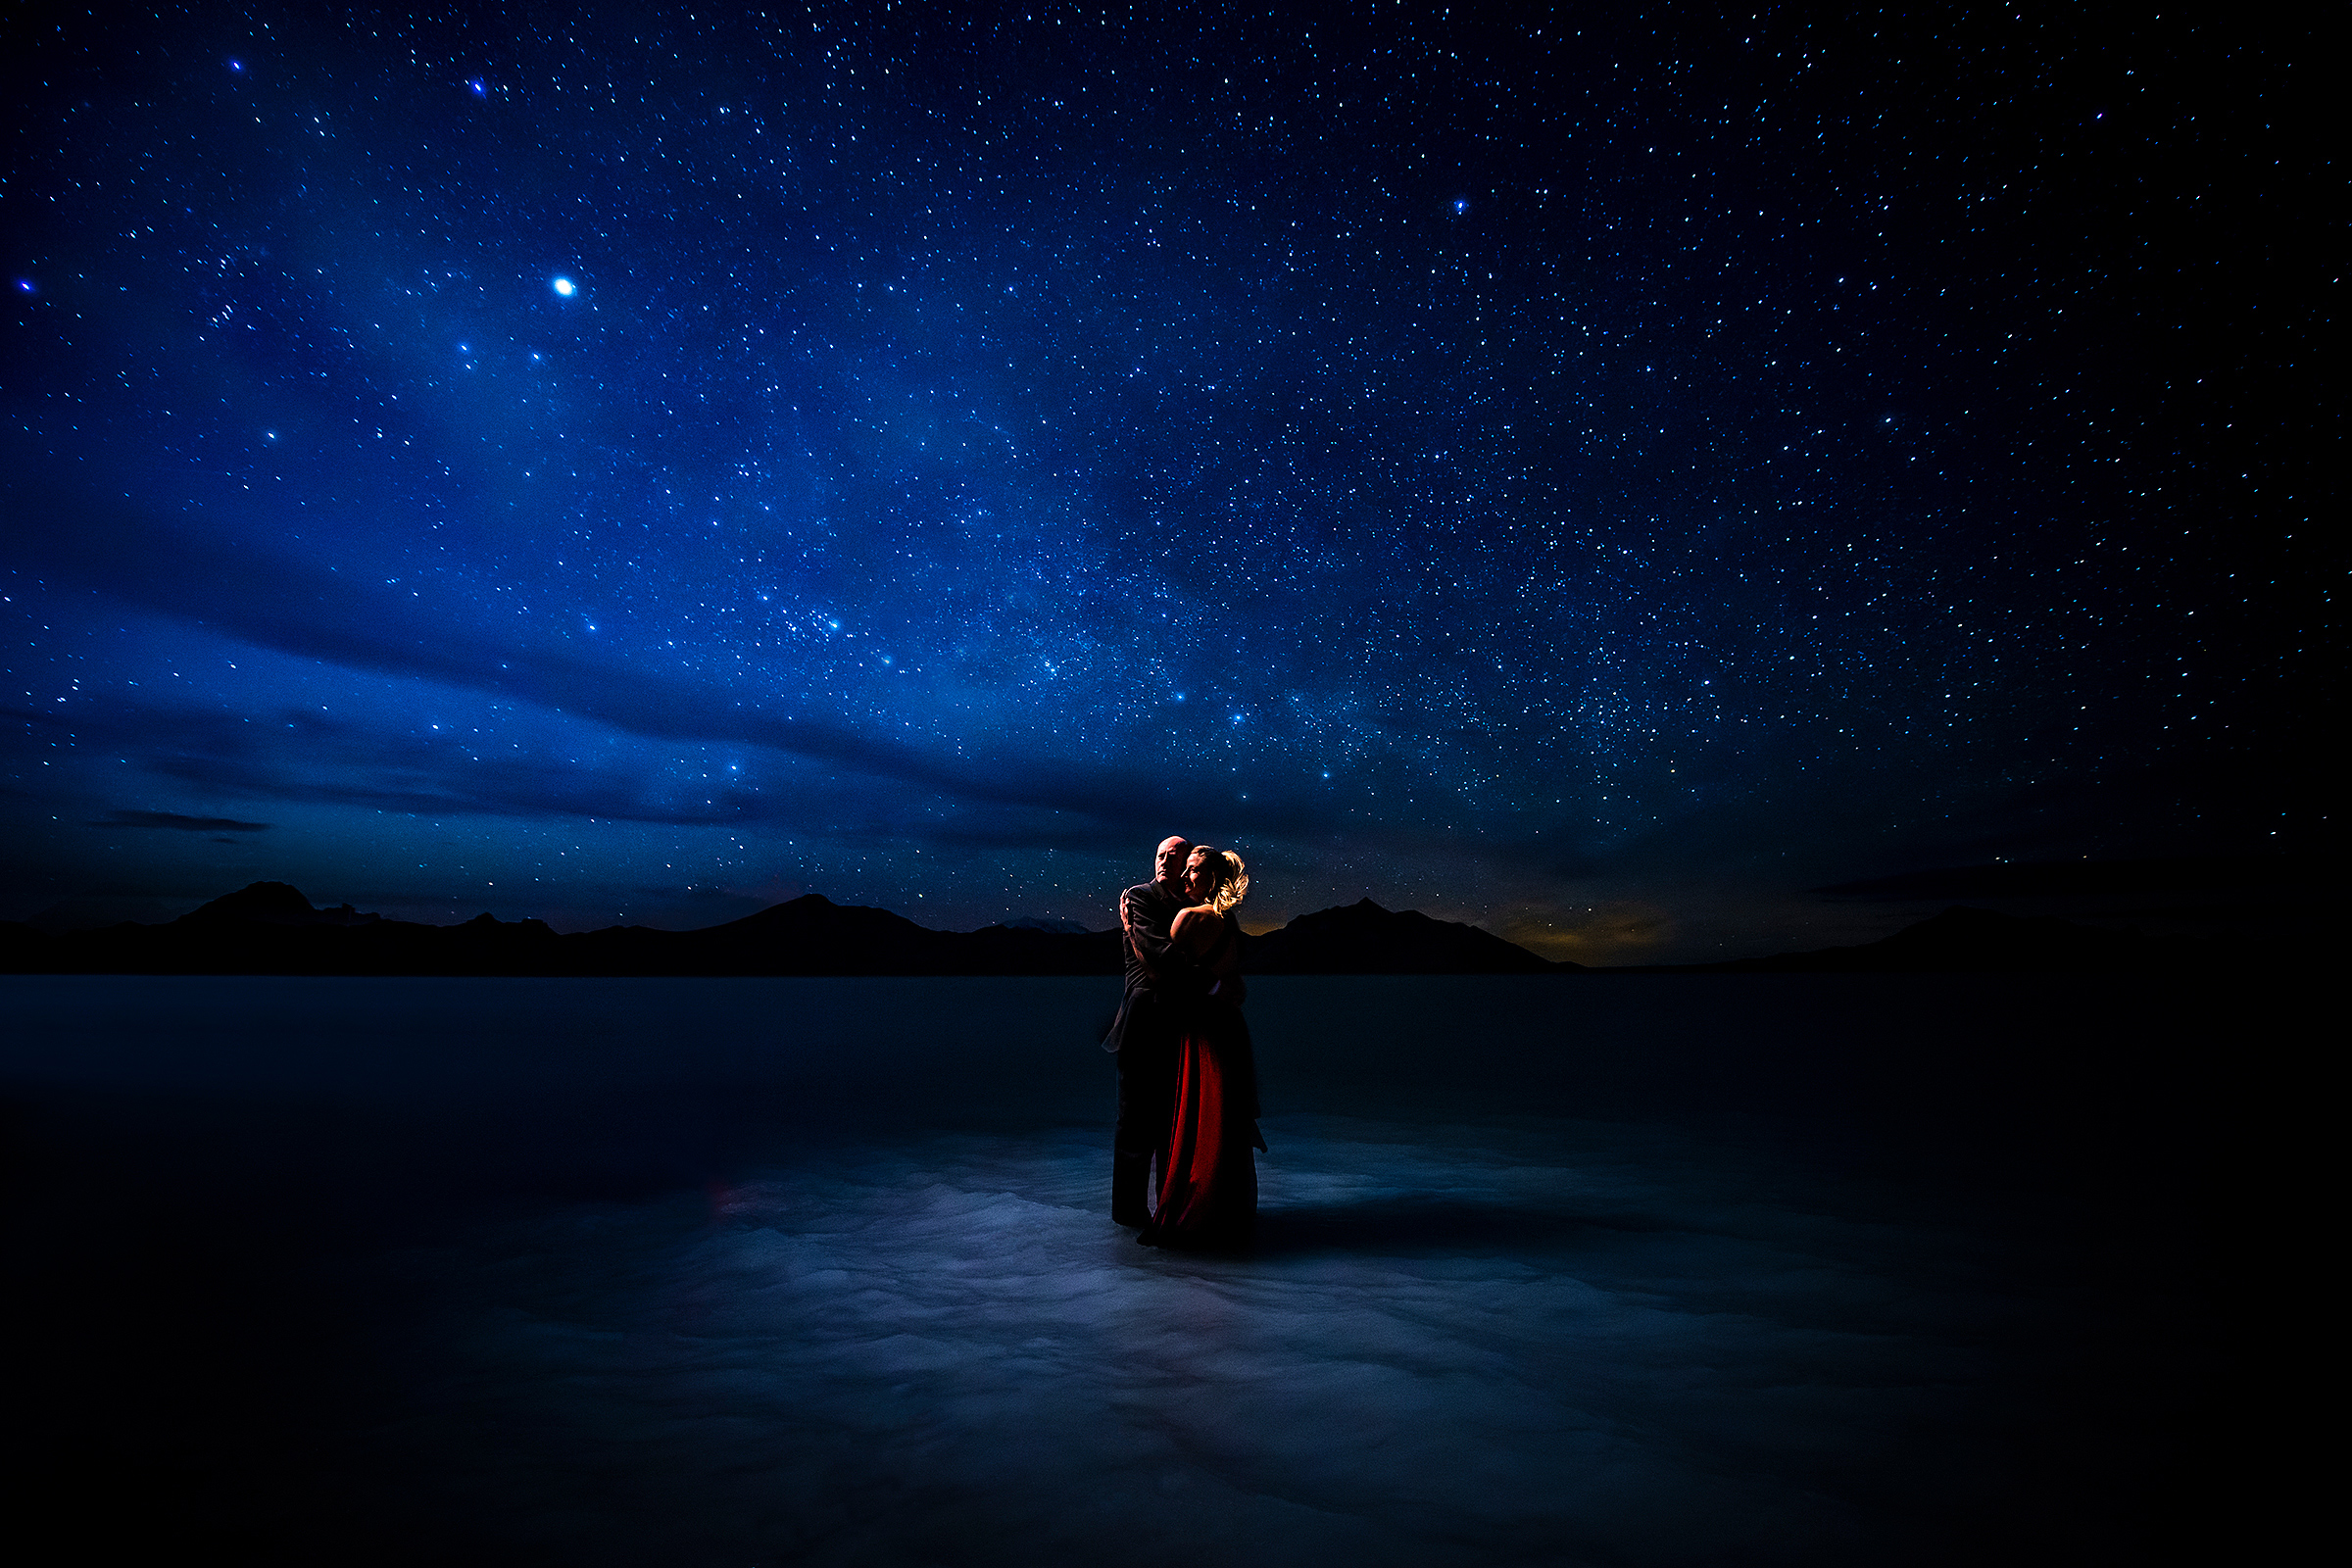 Partial silhouette against northern lights - photo by J La Plante Photo